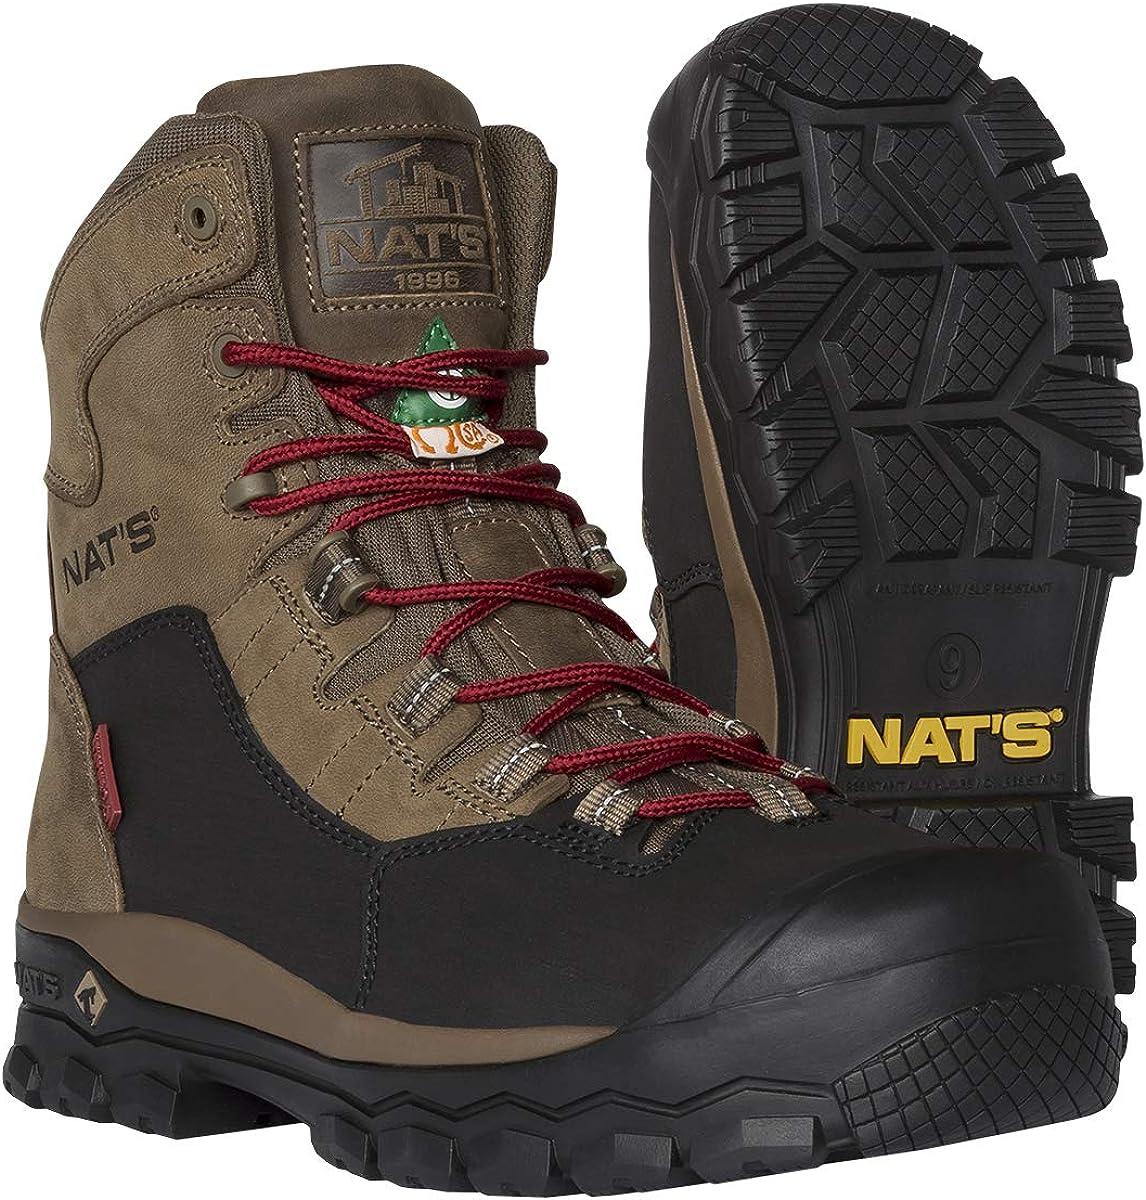 Waterproof Steel Toe Boots for Men